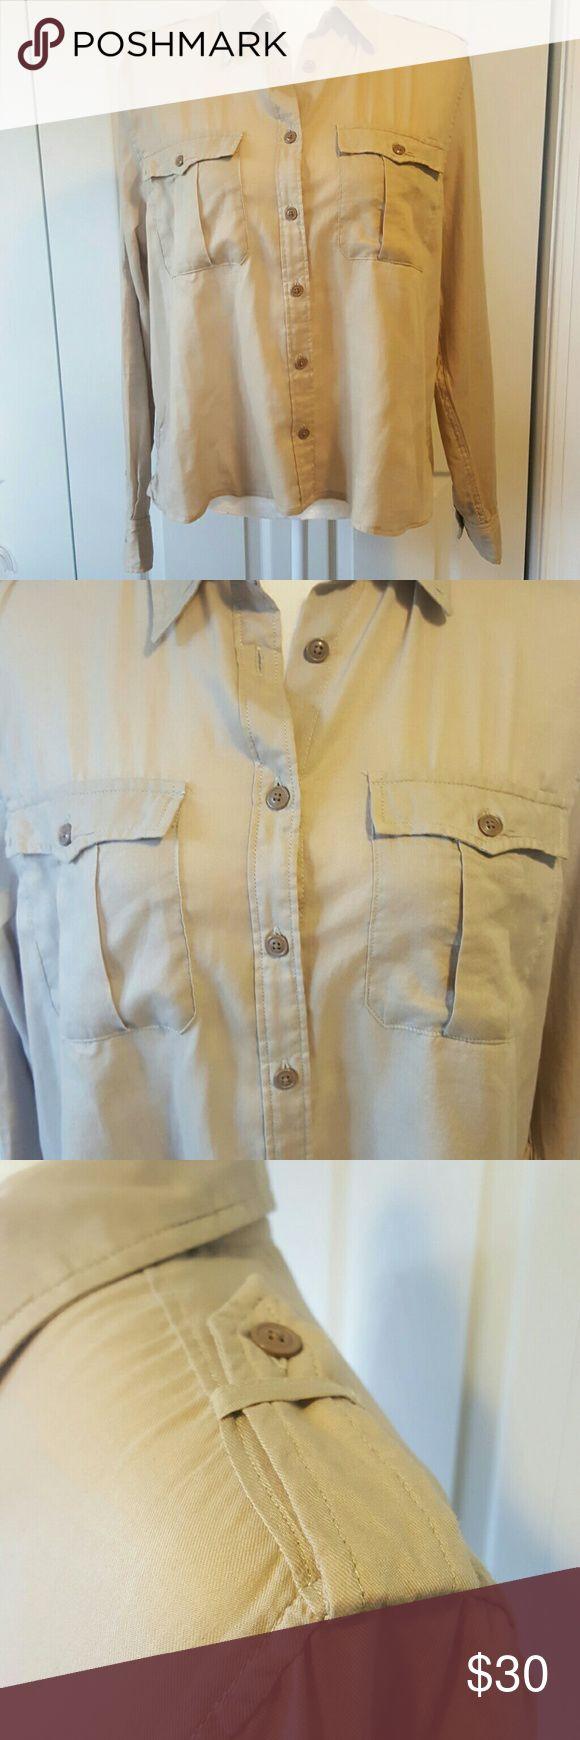 Ralph Lauren Denim Supply Tan Military Style Shirt Ralph Lauren Denim & Supply Tan Military Style Shirt, Size Large, 100%Cotton, lightweight, long sleeve, button down. Bundle 2 and save 20% Ralph Lauren Tops Button Down Shirts